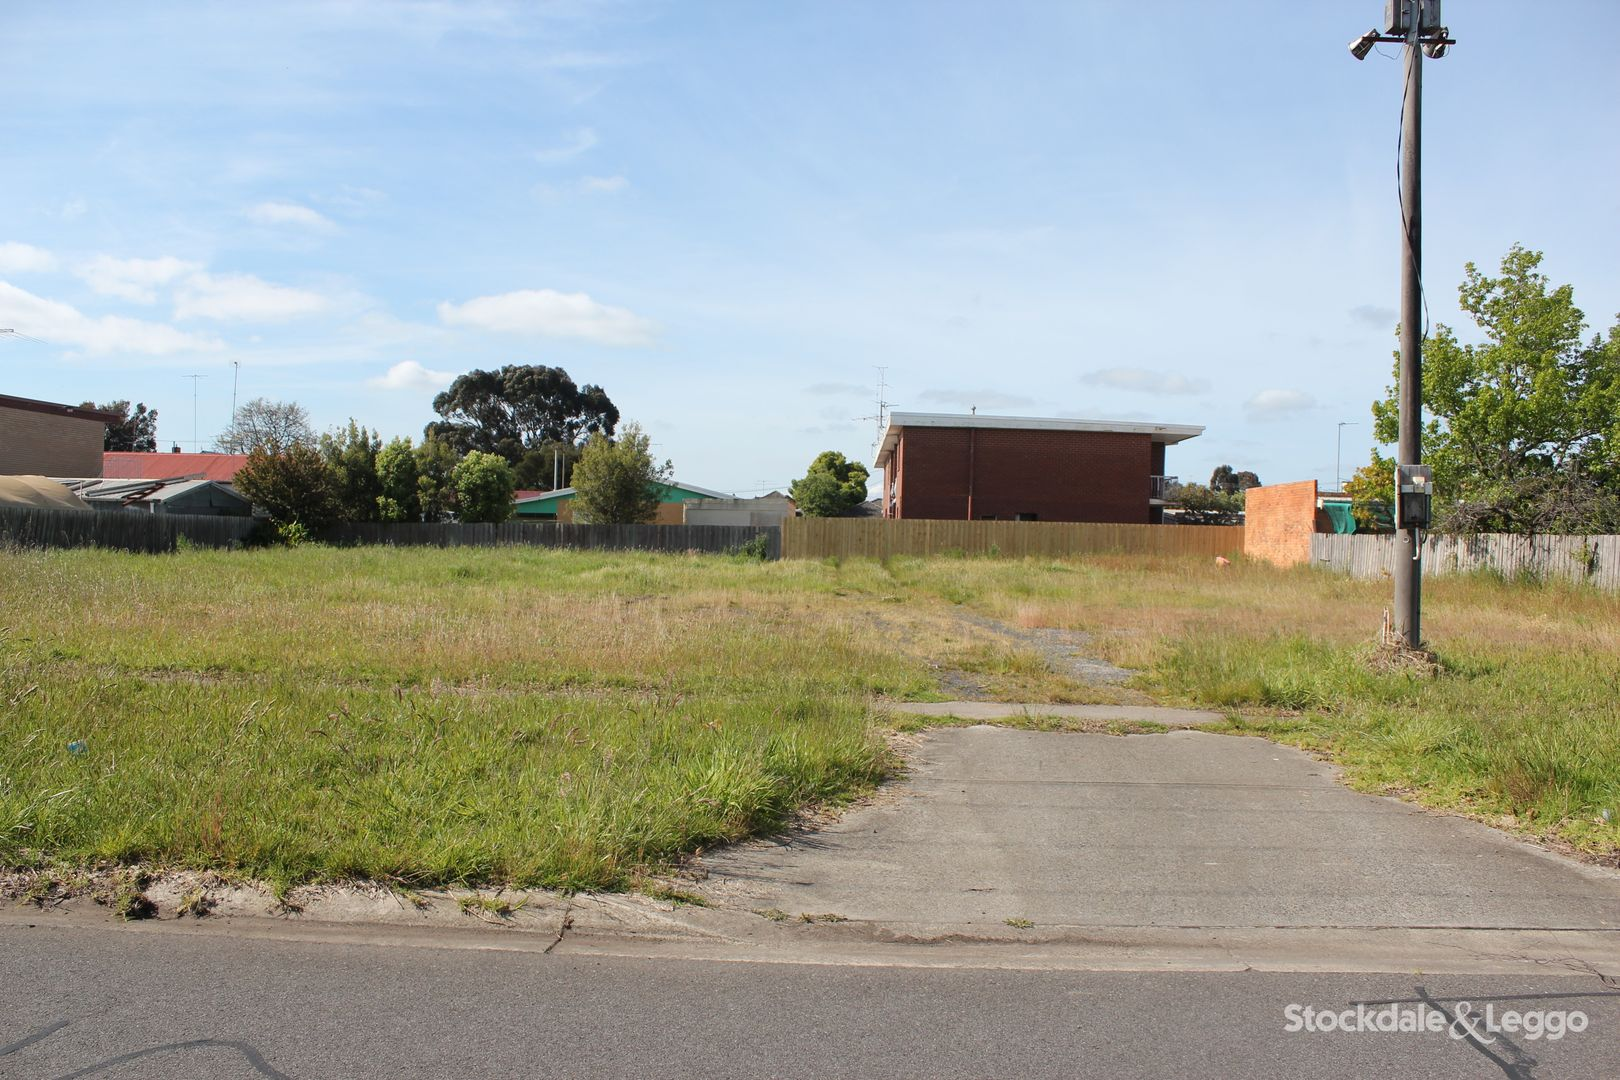 141 - 143 Buckley Street, Morwell VIC 3840, Image 0